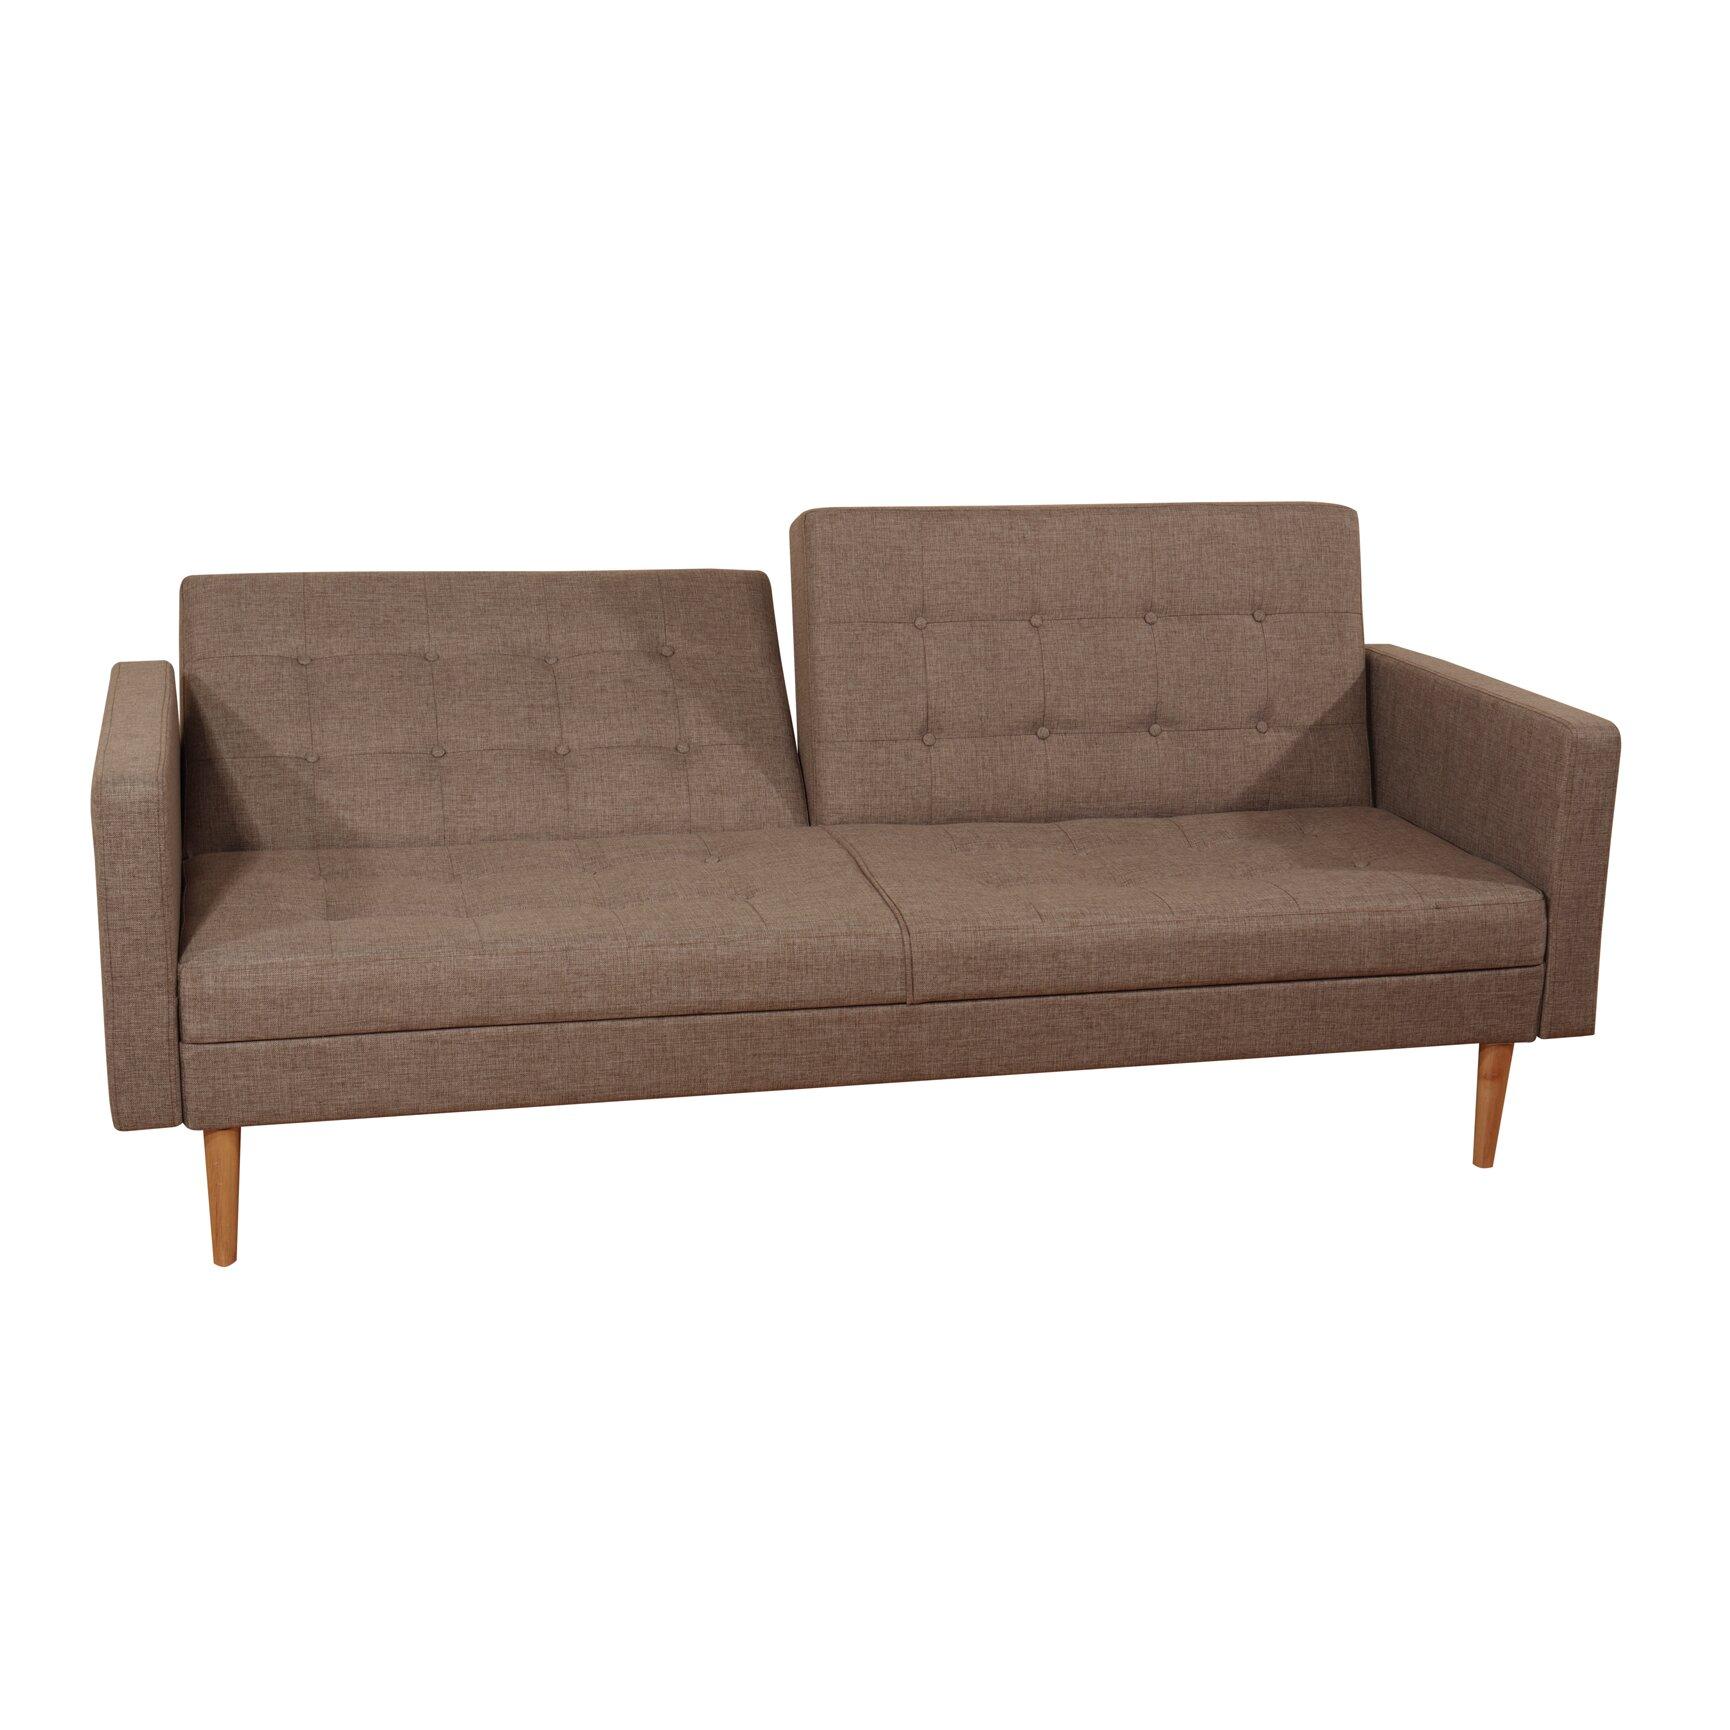 mercury row gaius 3 seater clic clac sofa bed reviews wayfair uk. Black Bedroom Furniture Sets. Home Design Ideas